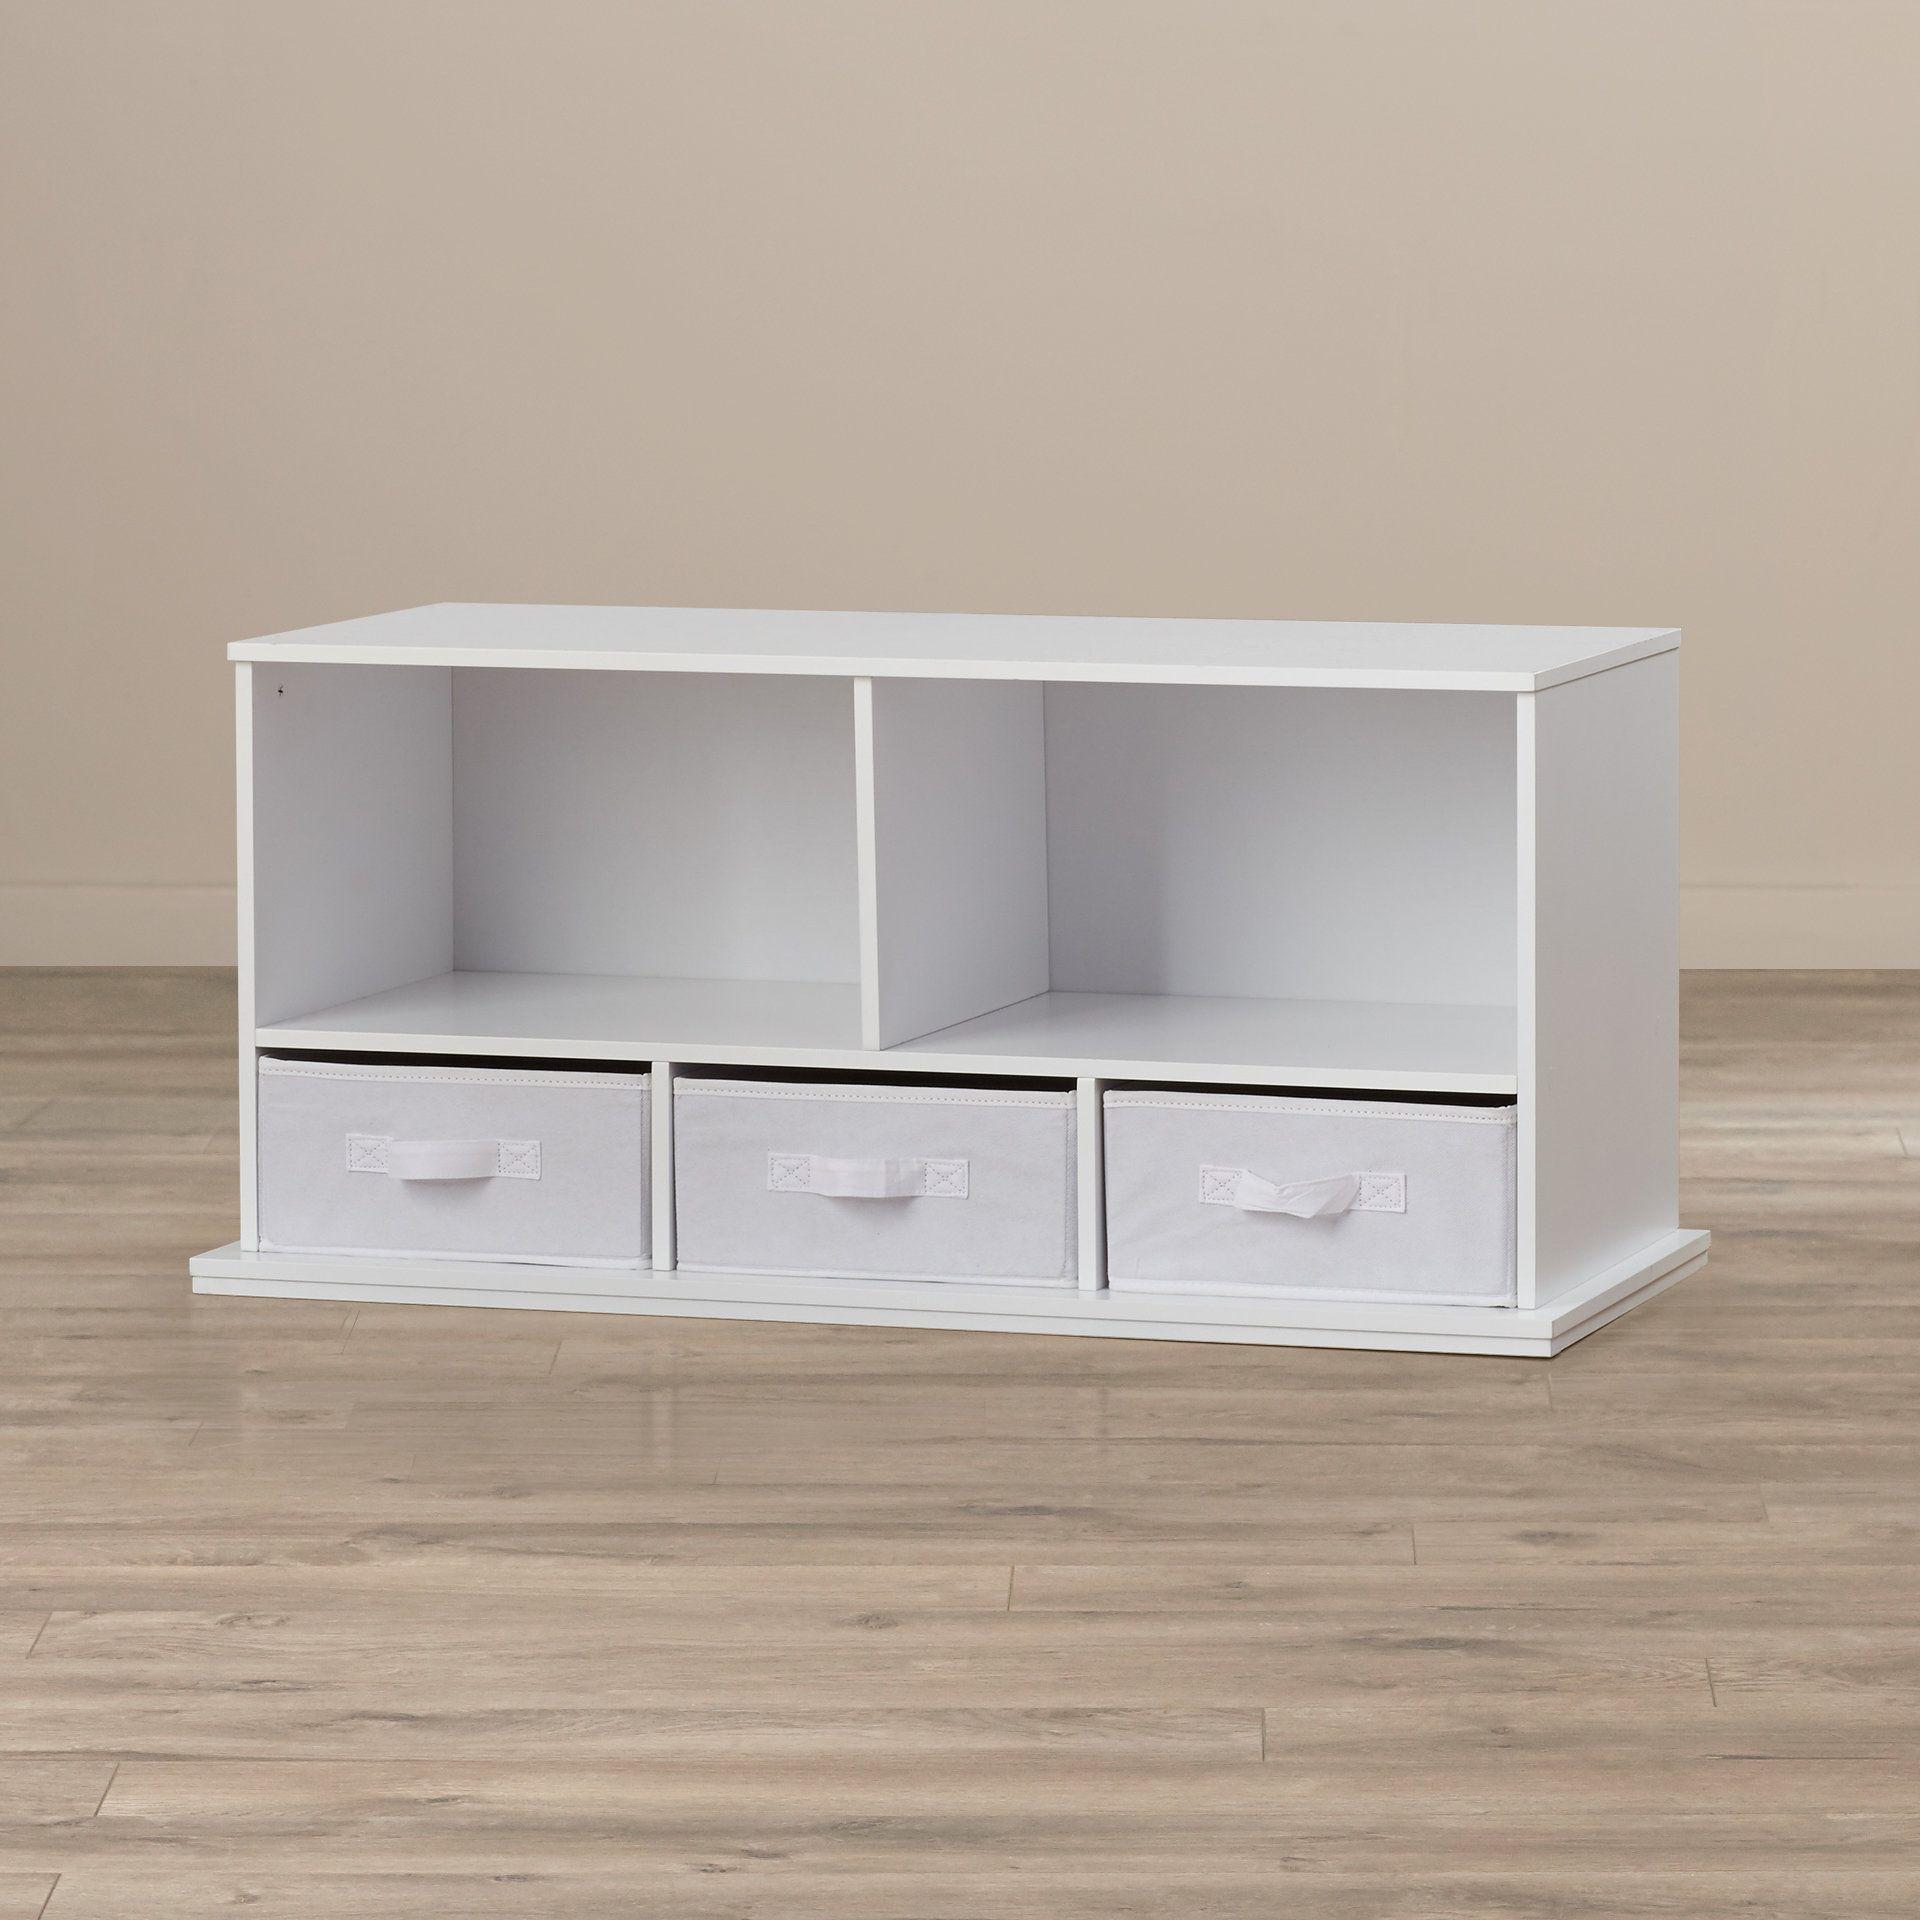 Ever Gabo Shelf Storage Cubby with 3 Baskets | Home Decor ...